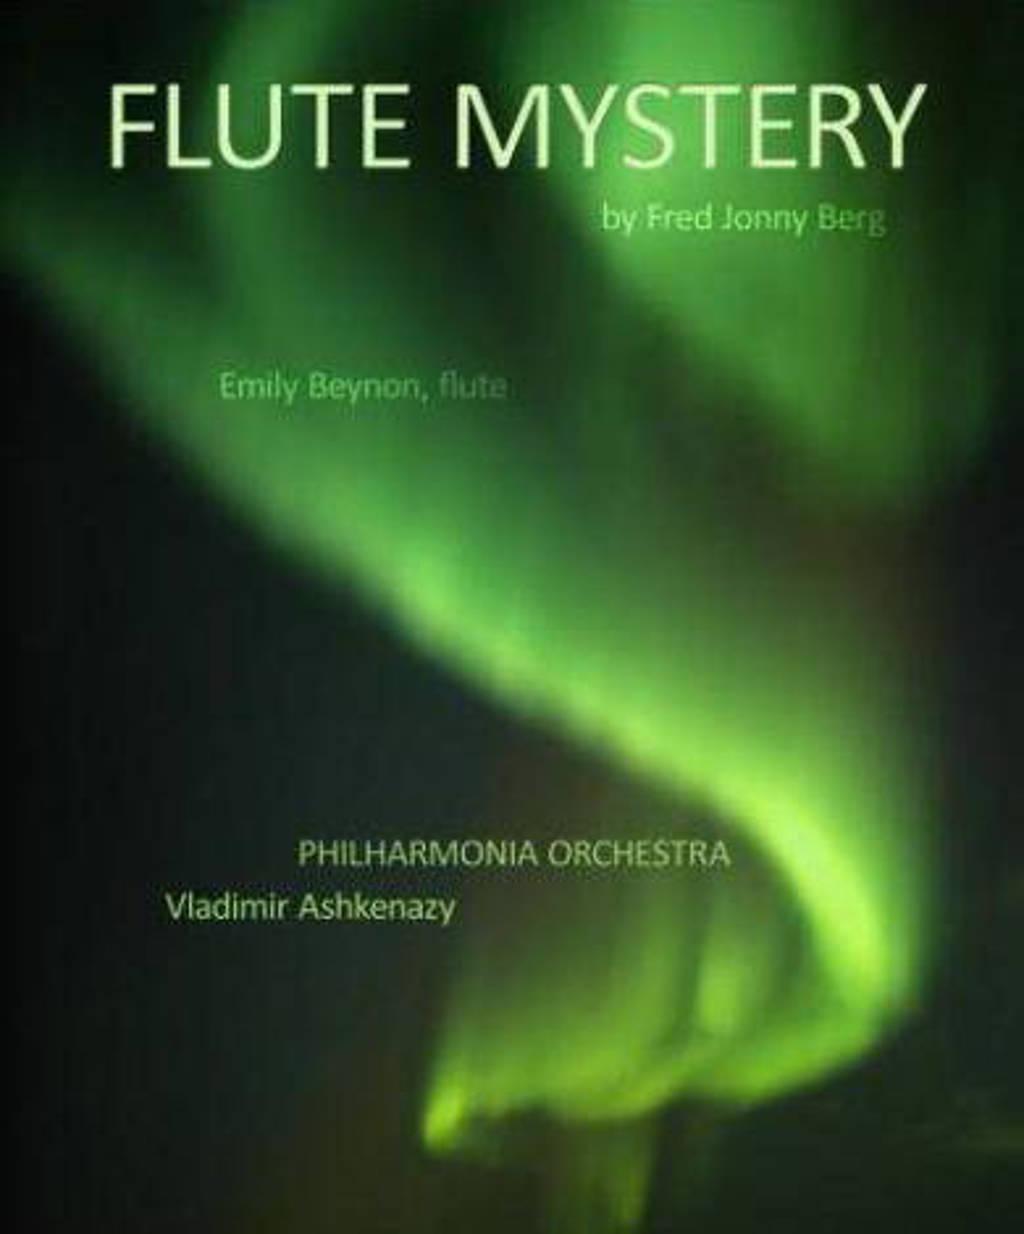 Philharmonia Orchestra - Flute Mystery (Blu-ray)